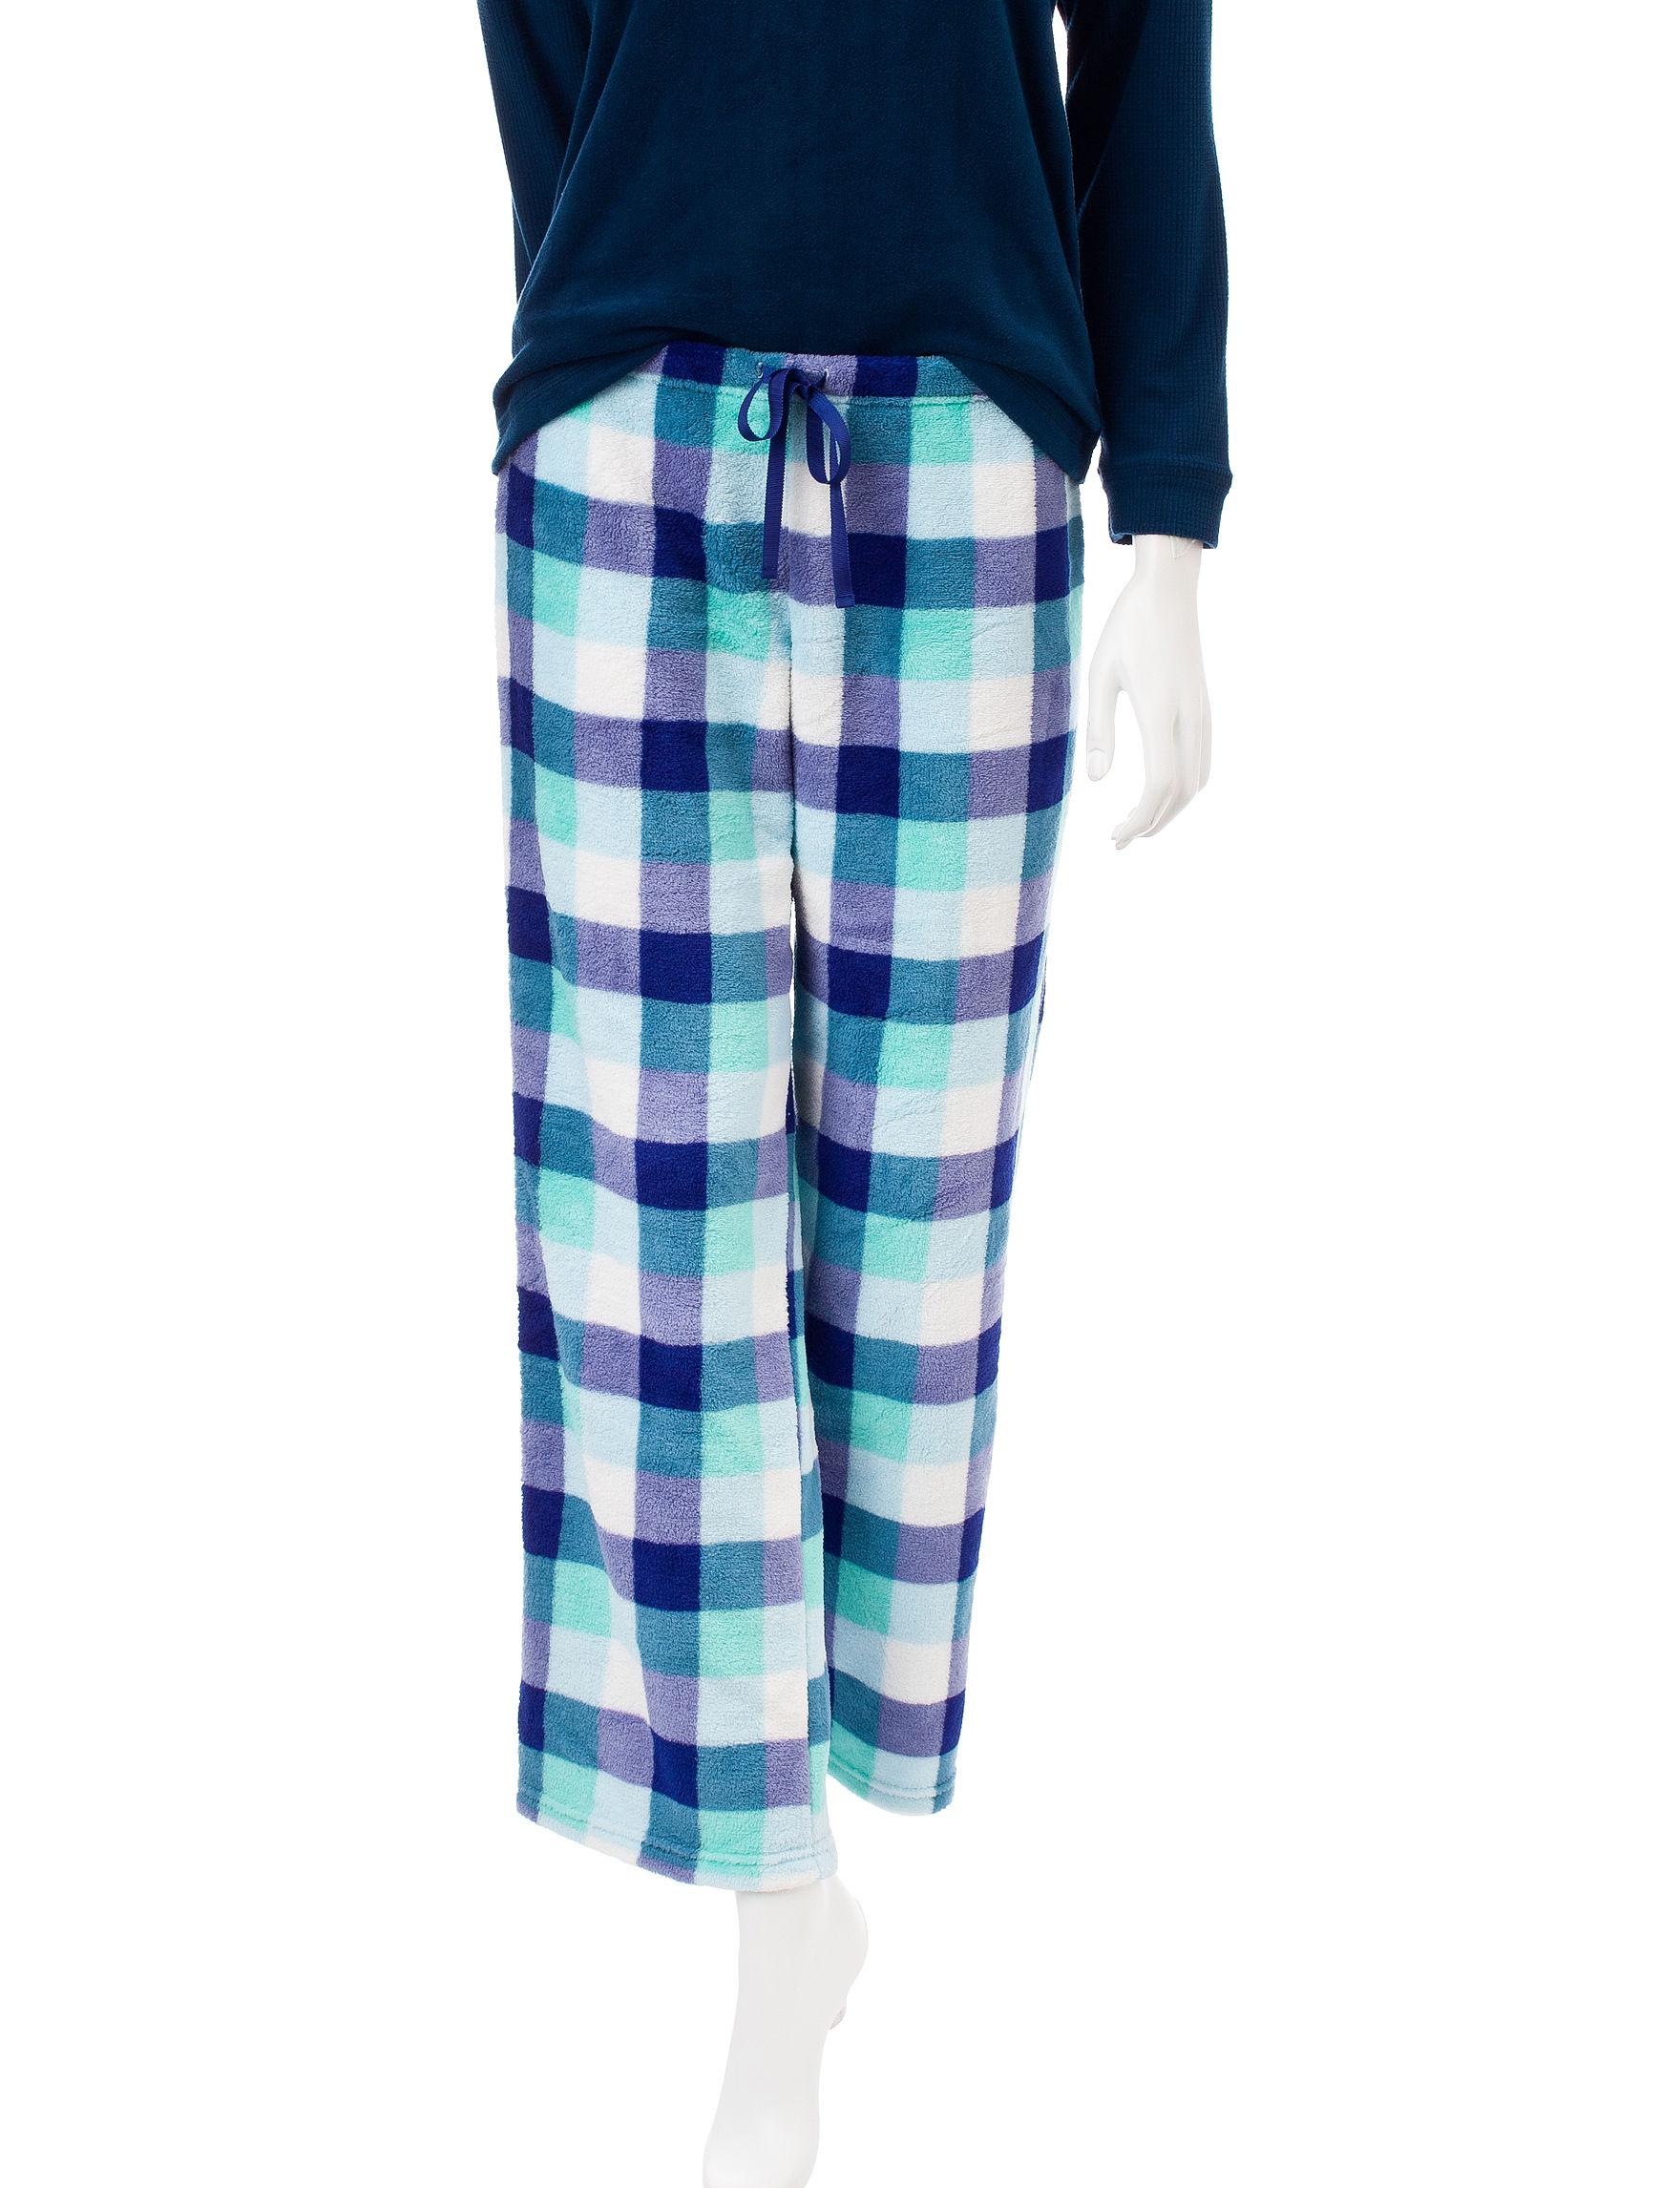 Wishful Park Blue Pajama Bottoms